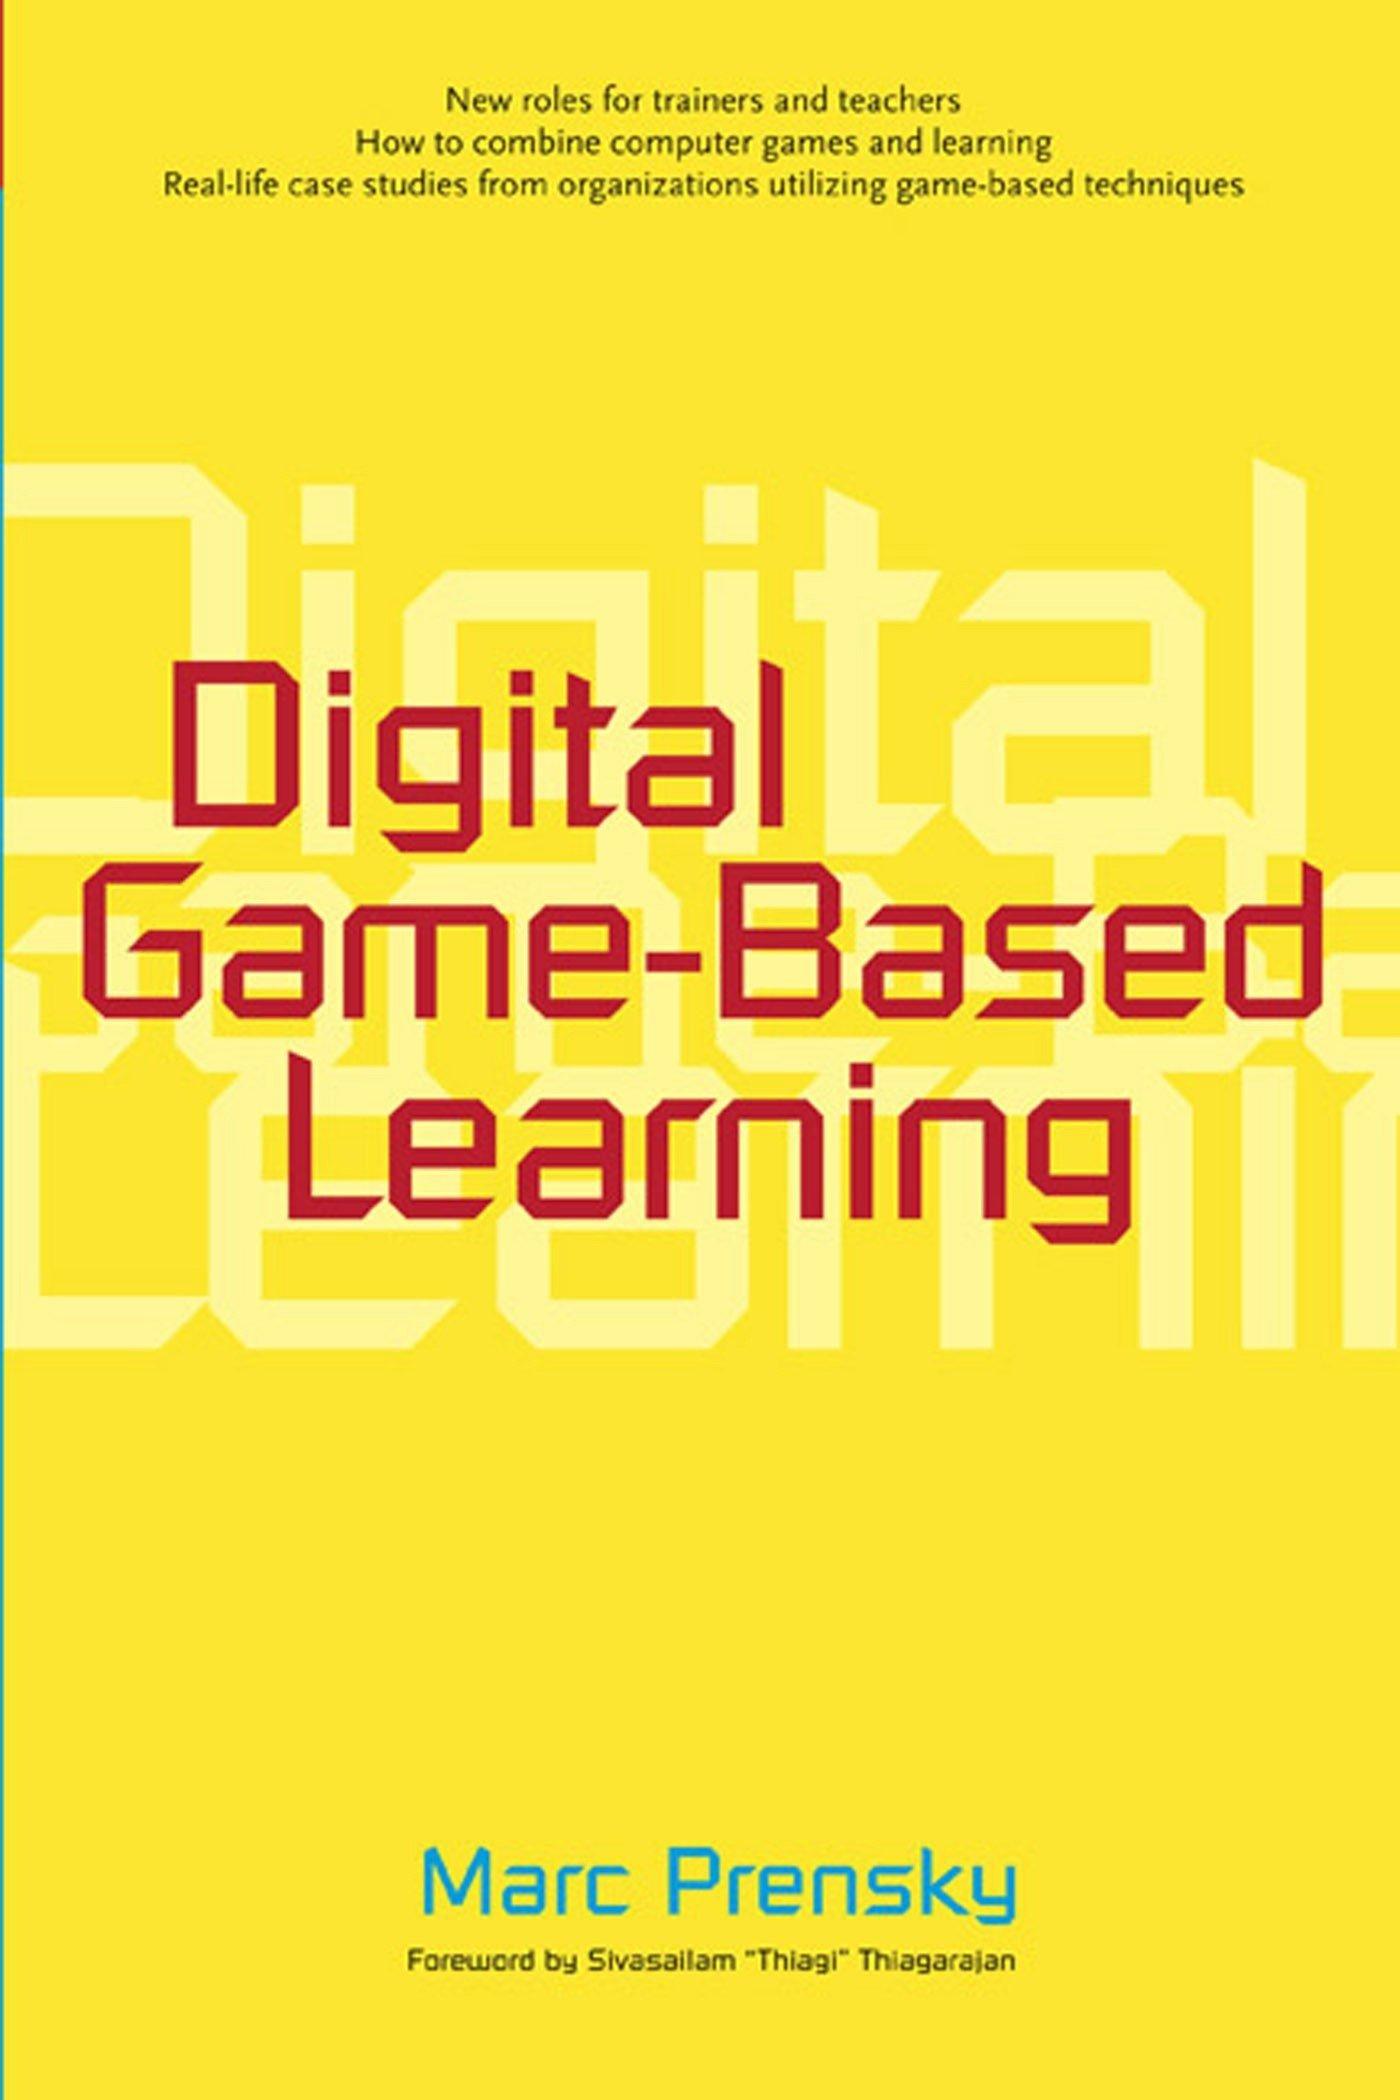 Digital Game-Based Learning: Amazon.de: Marc Prensky: Fremdsprachige Bücher